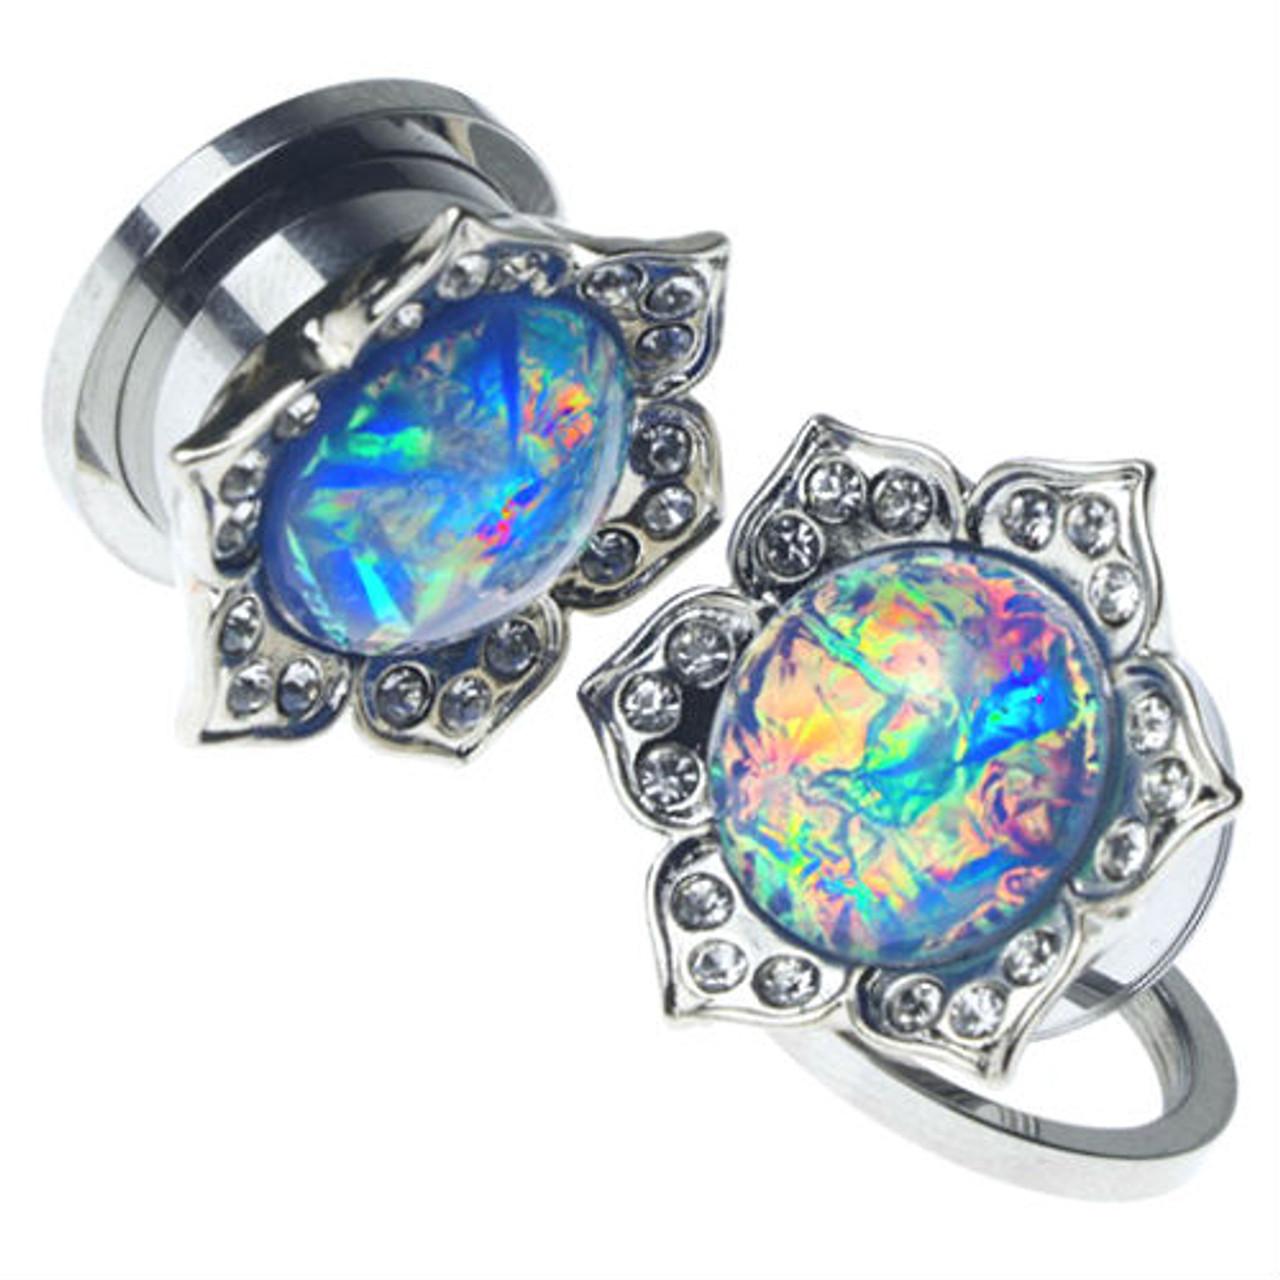 Stainless Steel Ear Tunnel White diamonds Synthetic Opal Ear Plugs Gauges Screw